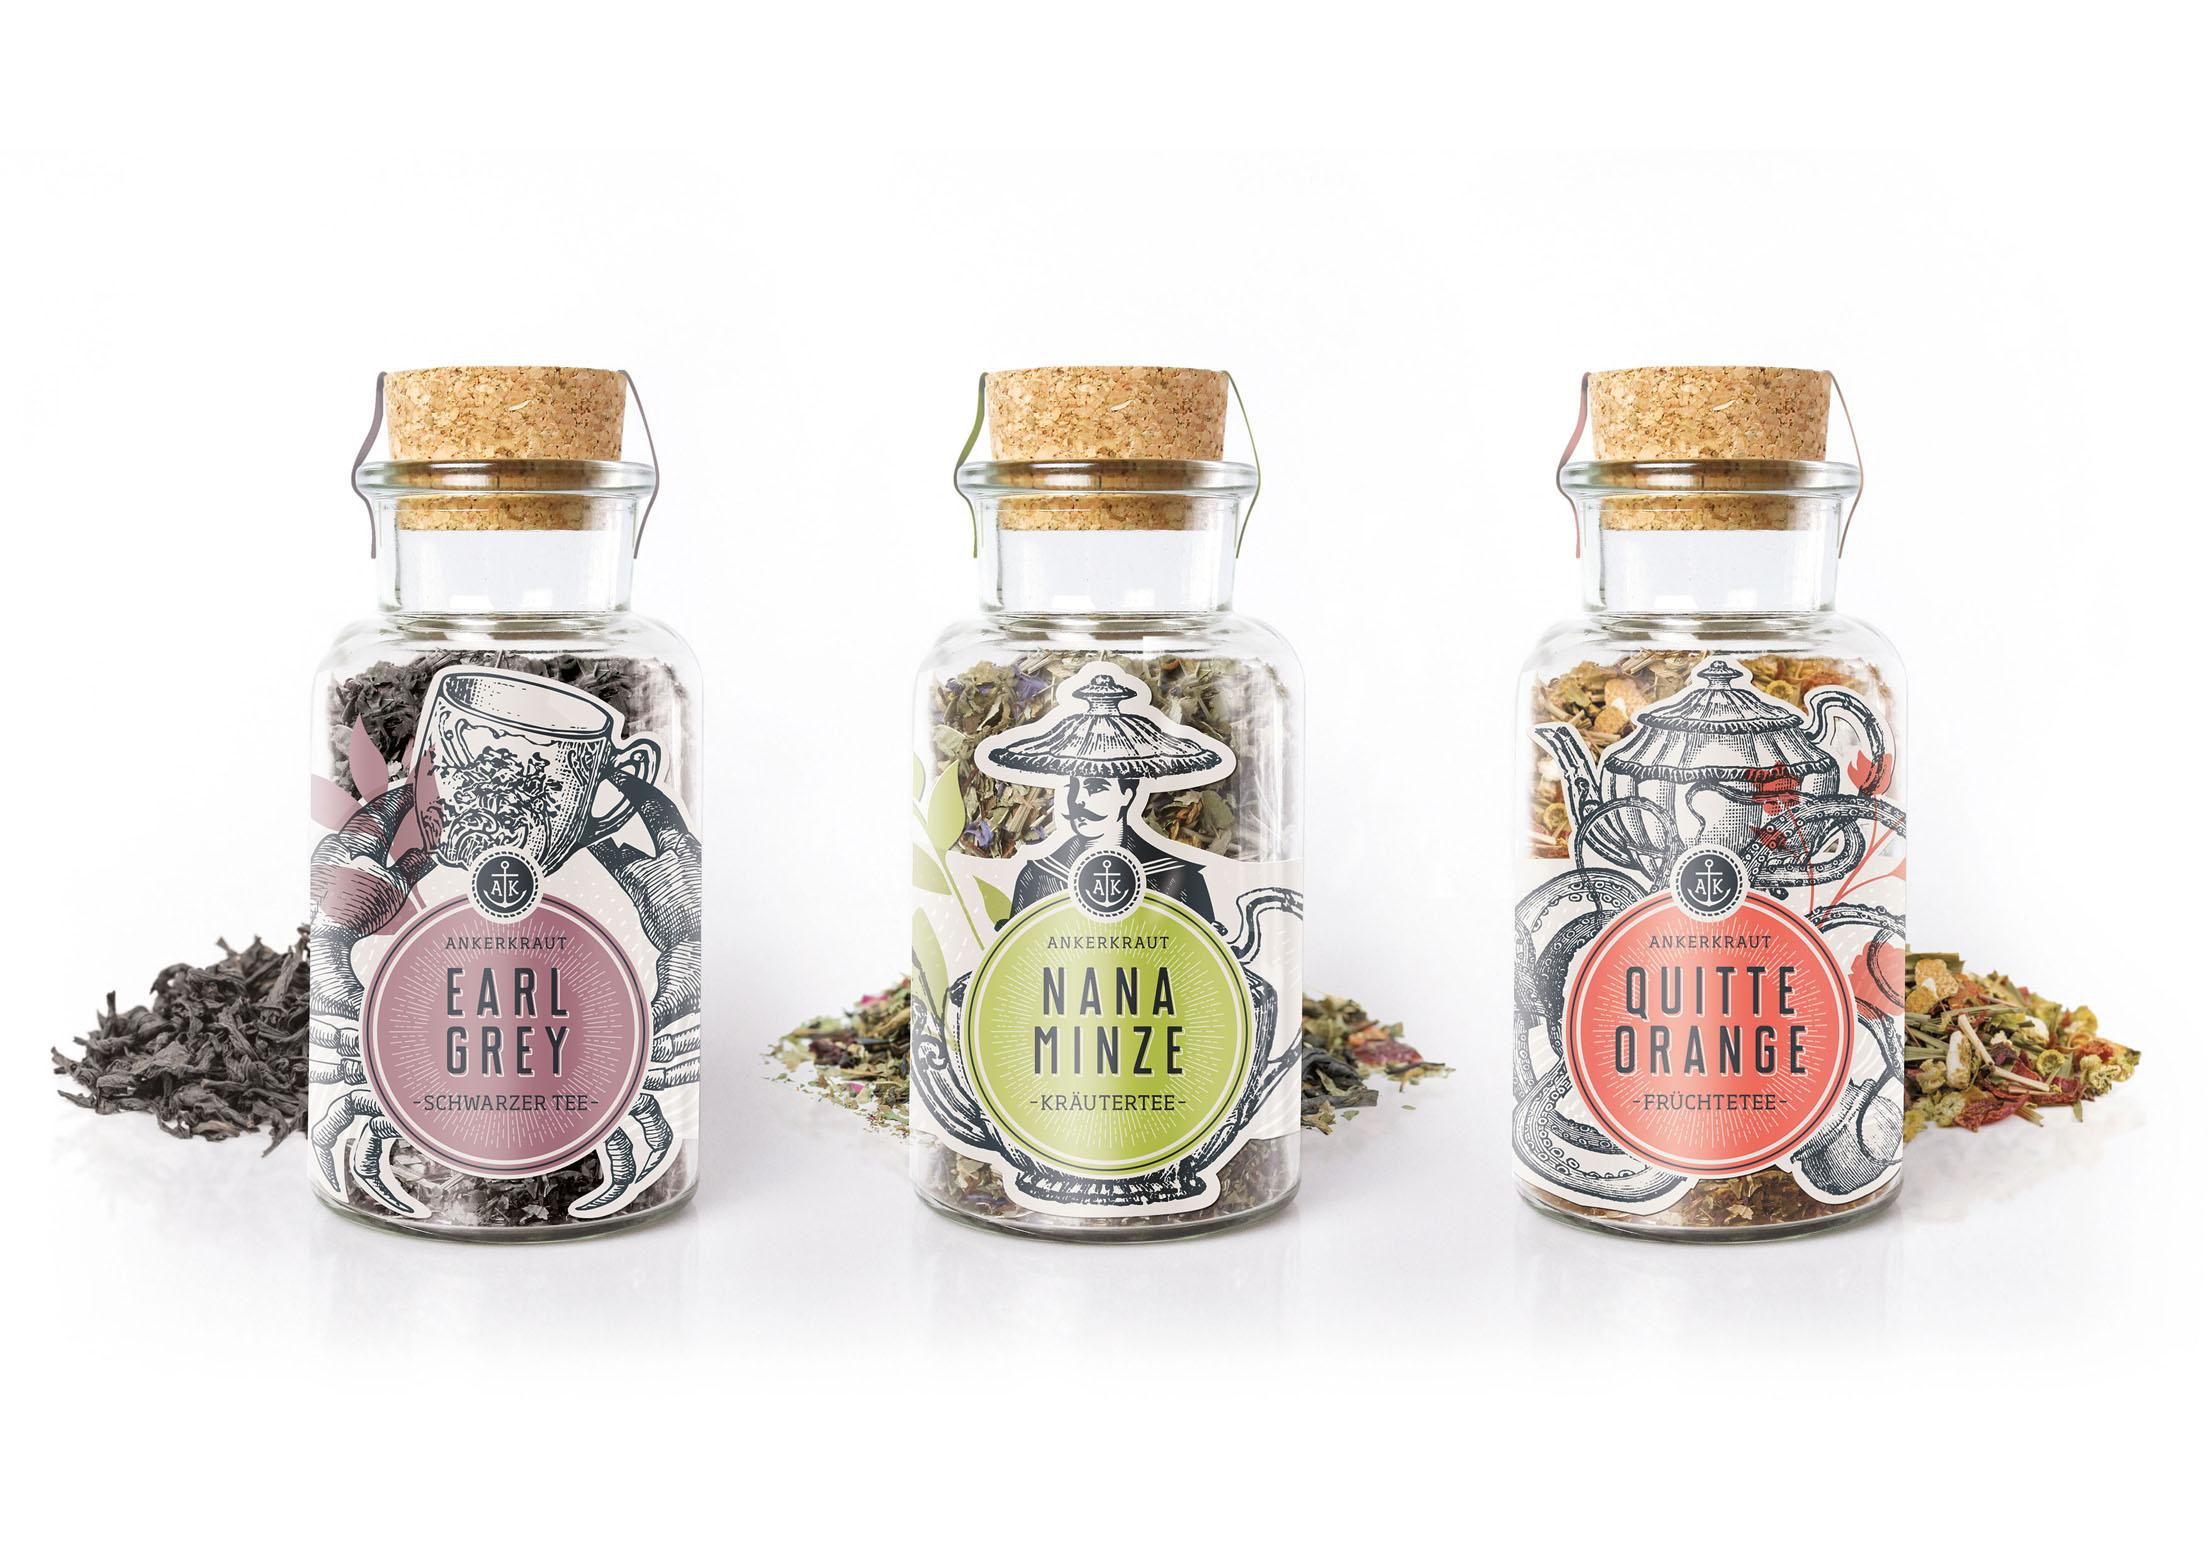 ankerkraut tee range winner packaging. Black Bedroom Furniture Sets. Home Design Ideas